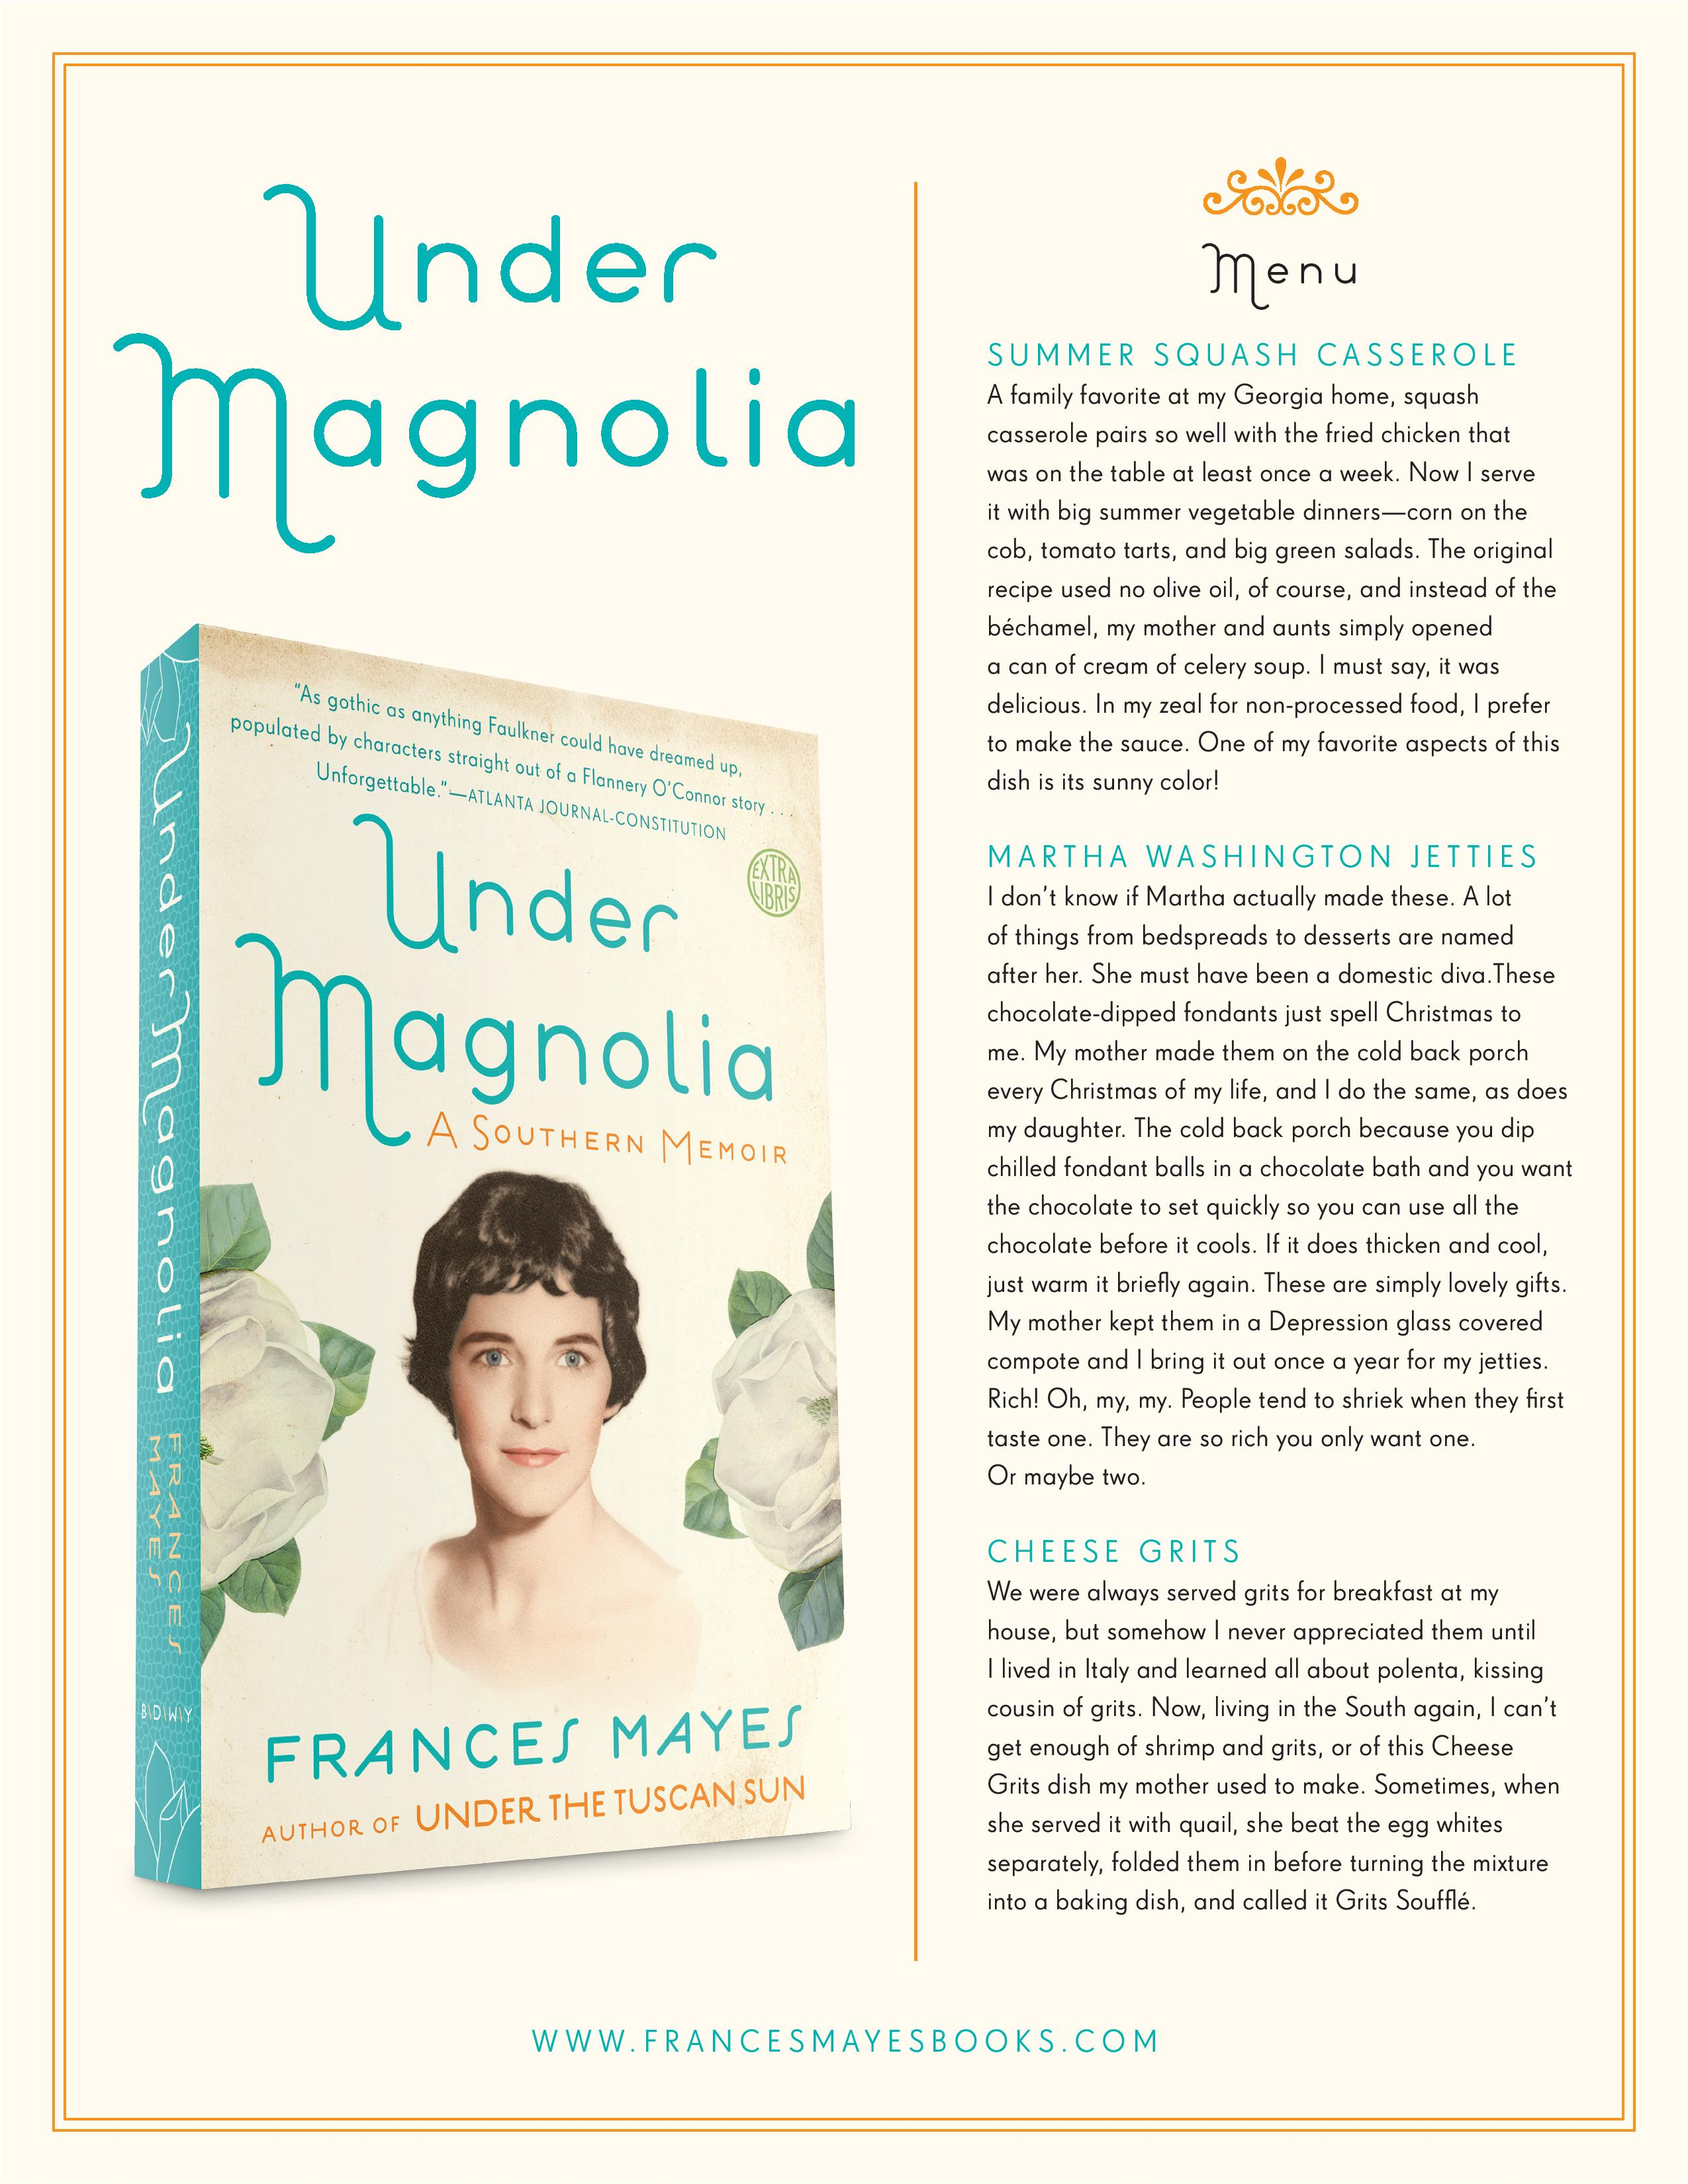 under magnolia southern menu frances mayes